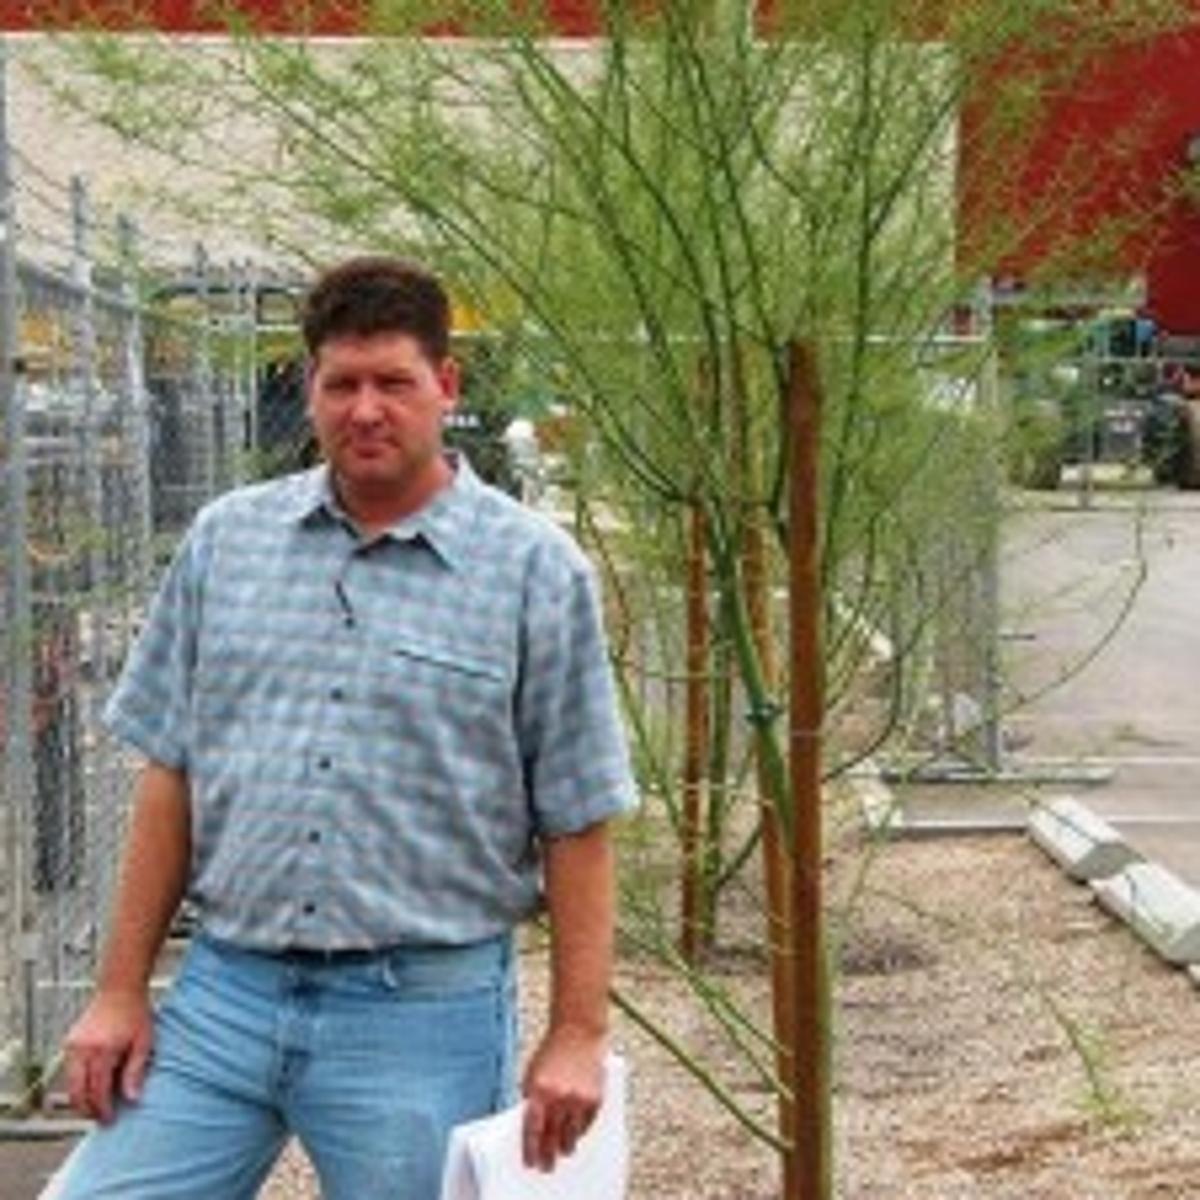 Tucson rainwater harvesting law drawing interest | News